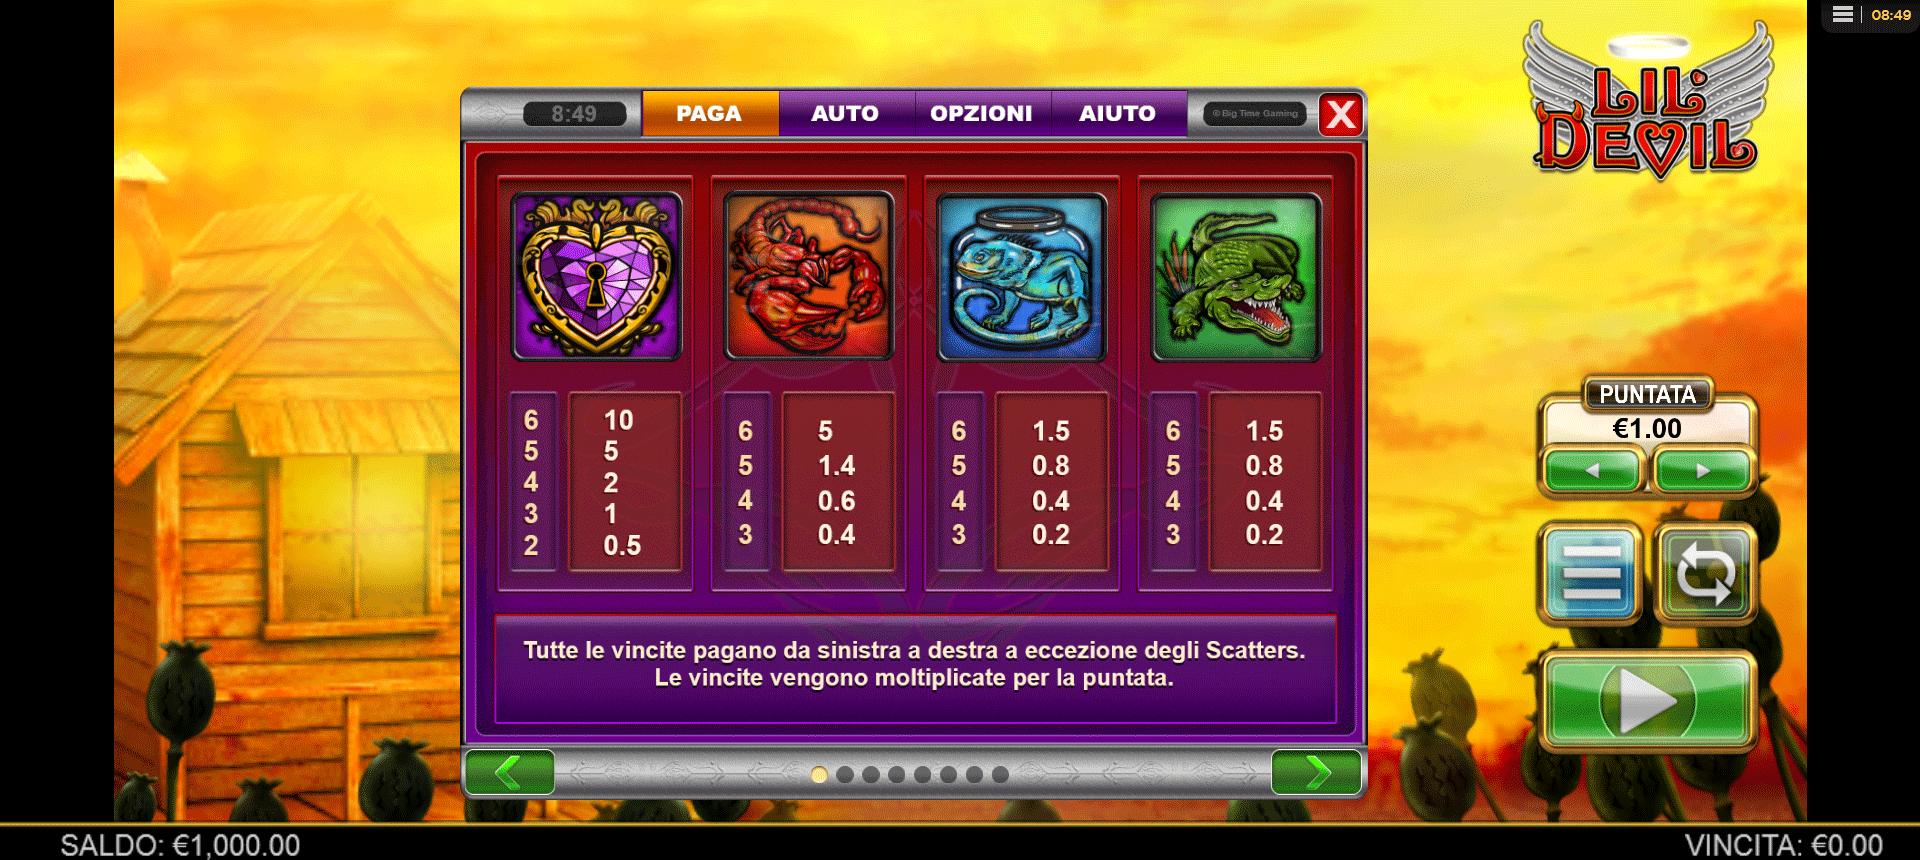 paytable slot machine lil devil